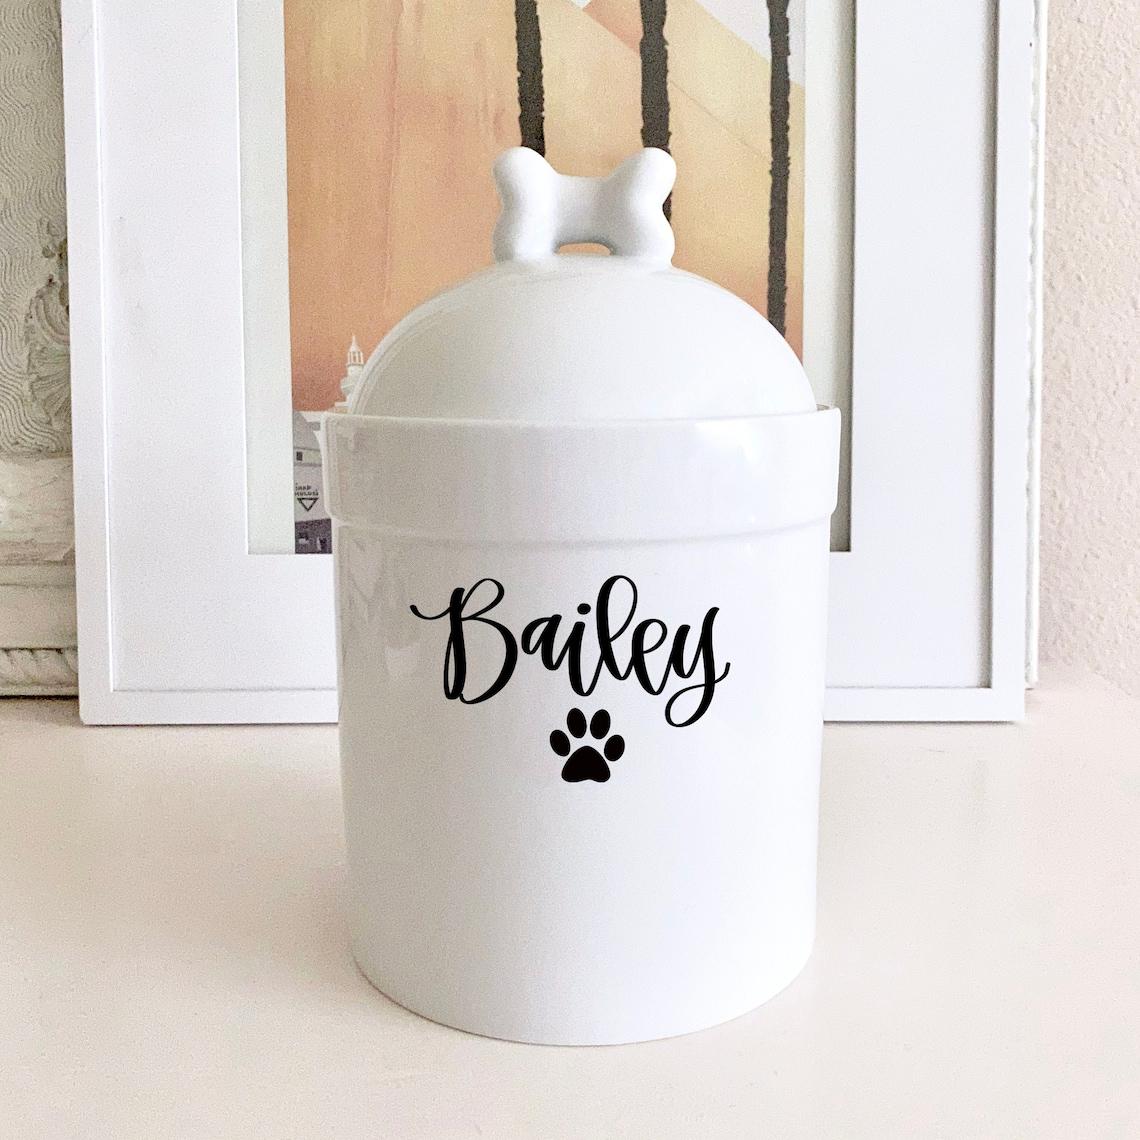 Dog Treat Container Personalized  Large Dog Treat Jar  image 0